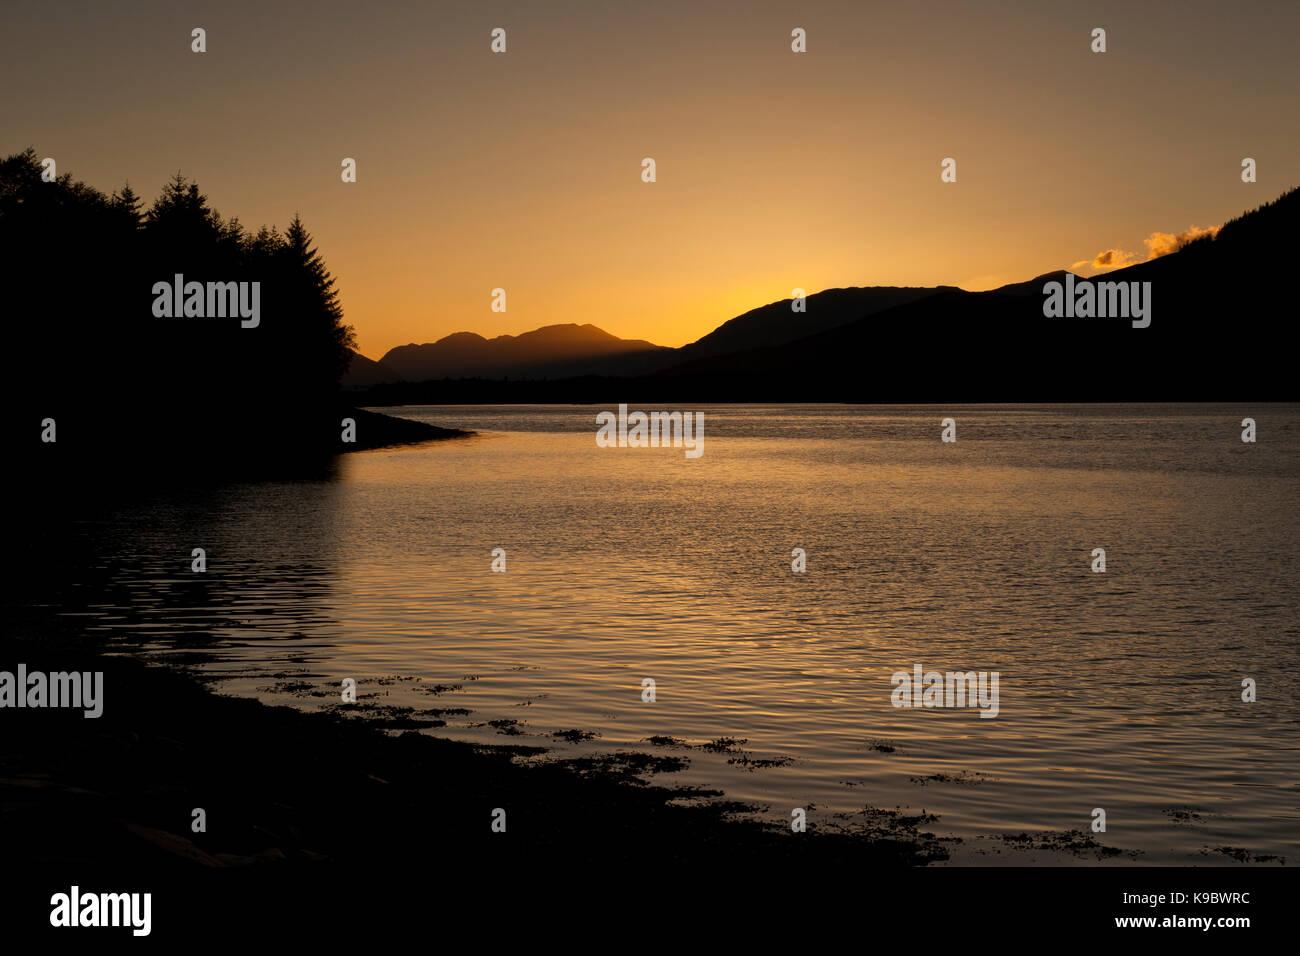 Sunset behind the hills and mountains of North Ballachulish, Glencoe, Scotland, UK - Stock Image